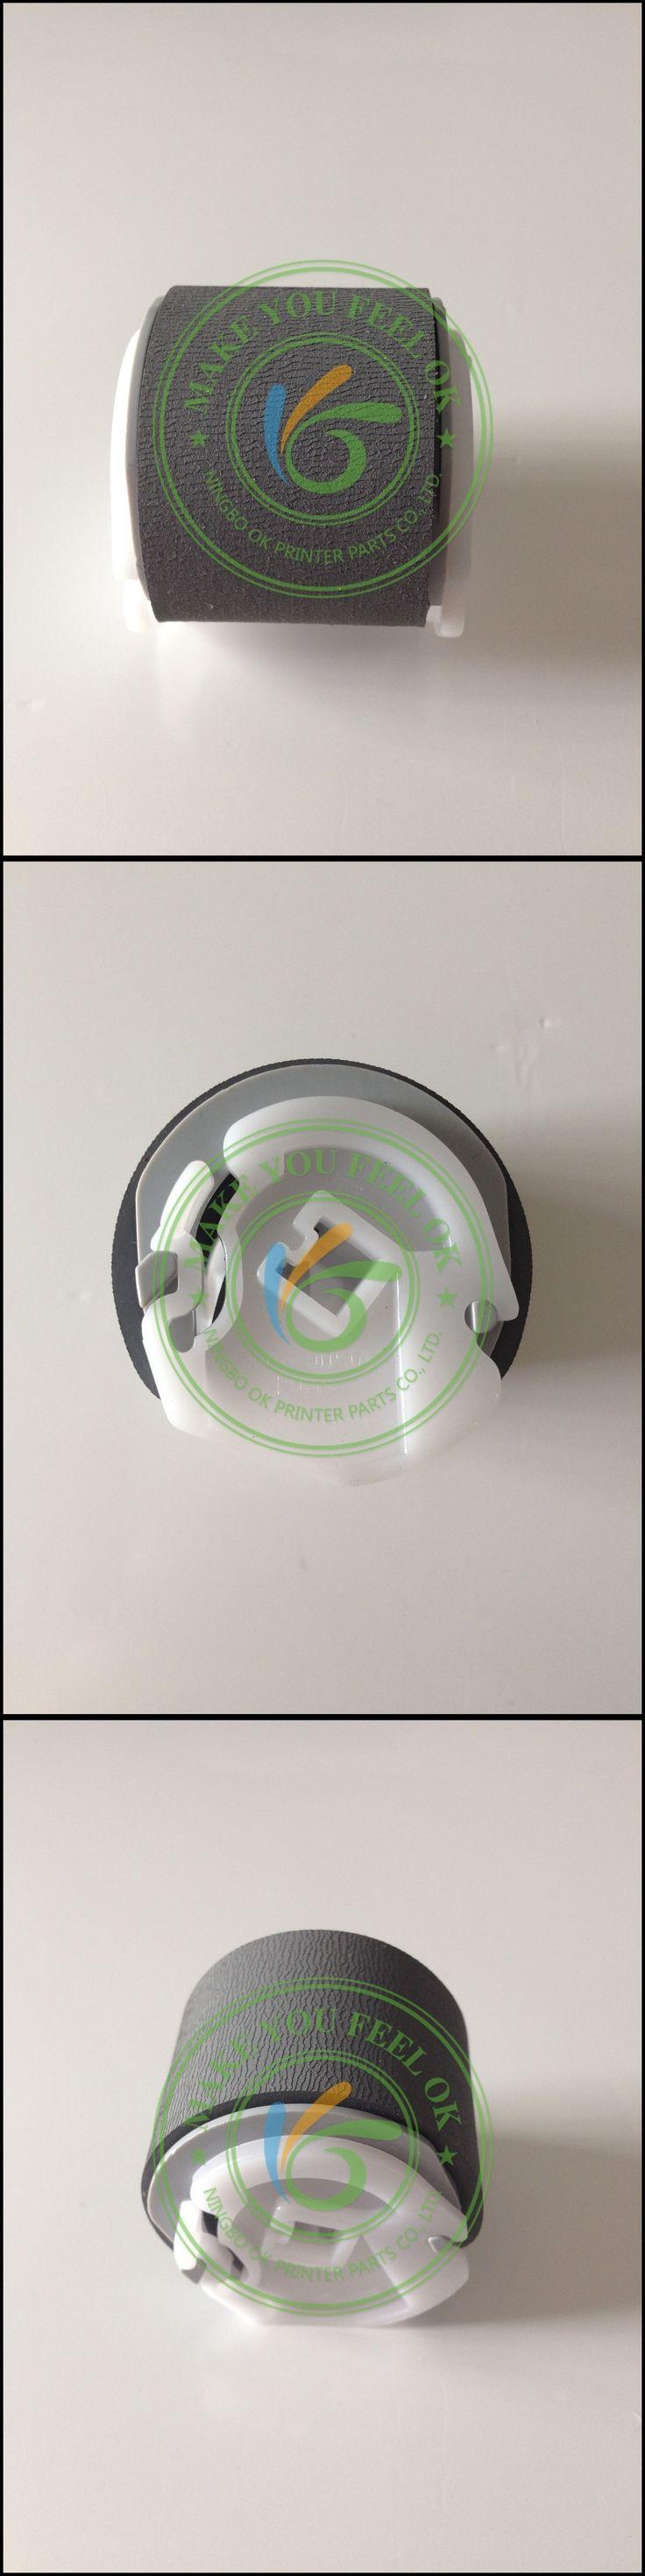 ORIGINAL NEW JC73 A JC73 A 130N Paper Pickup Roller for Samsung ML1610 1640